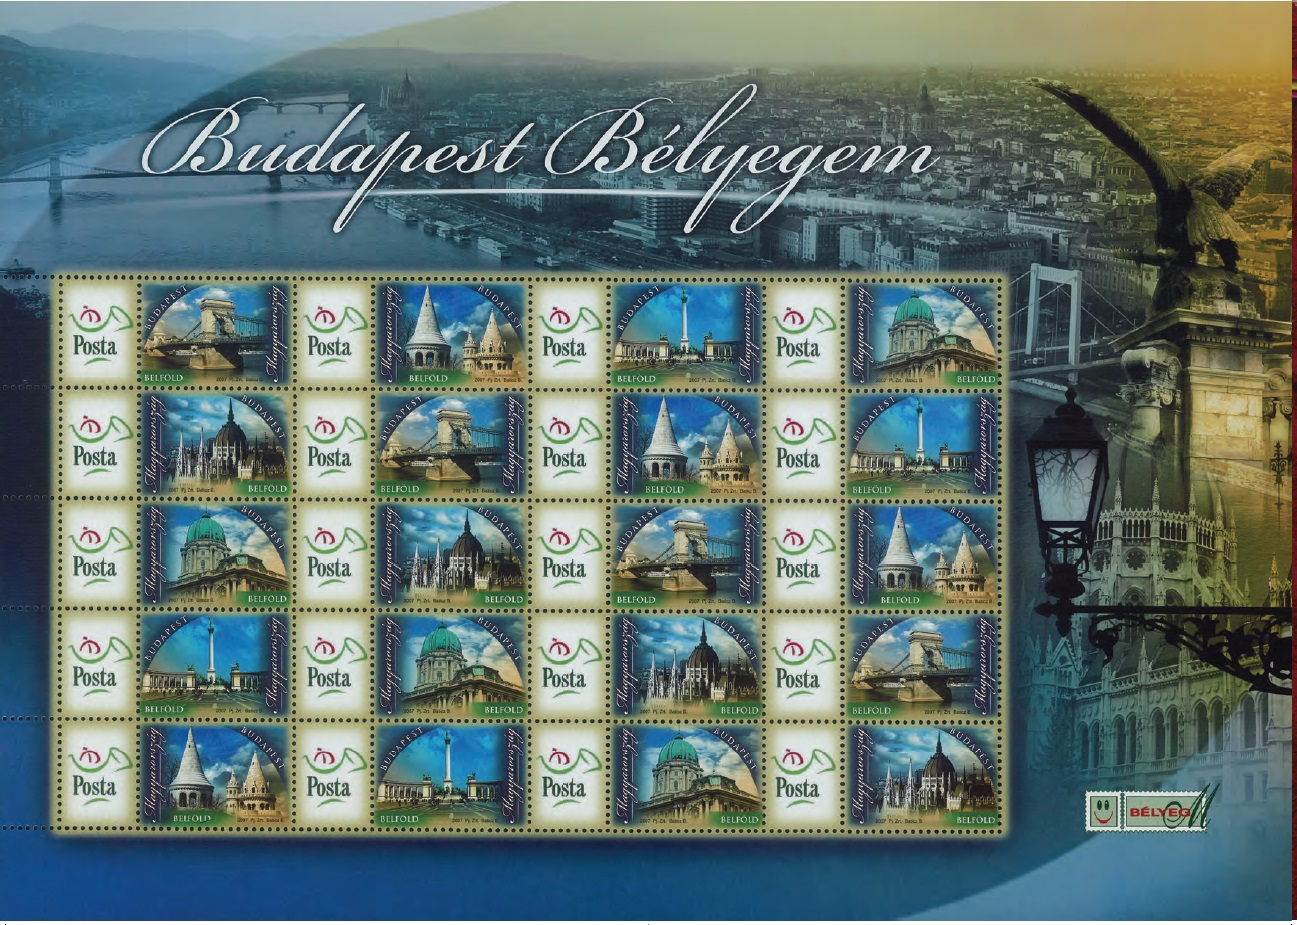 szb_budapest_belyegem